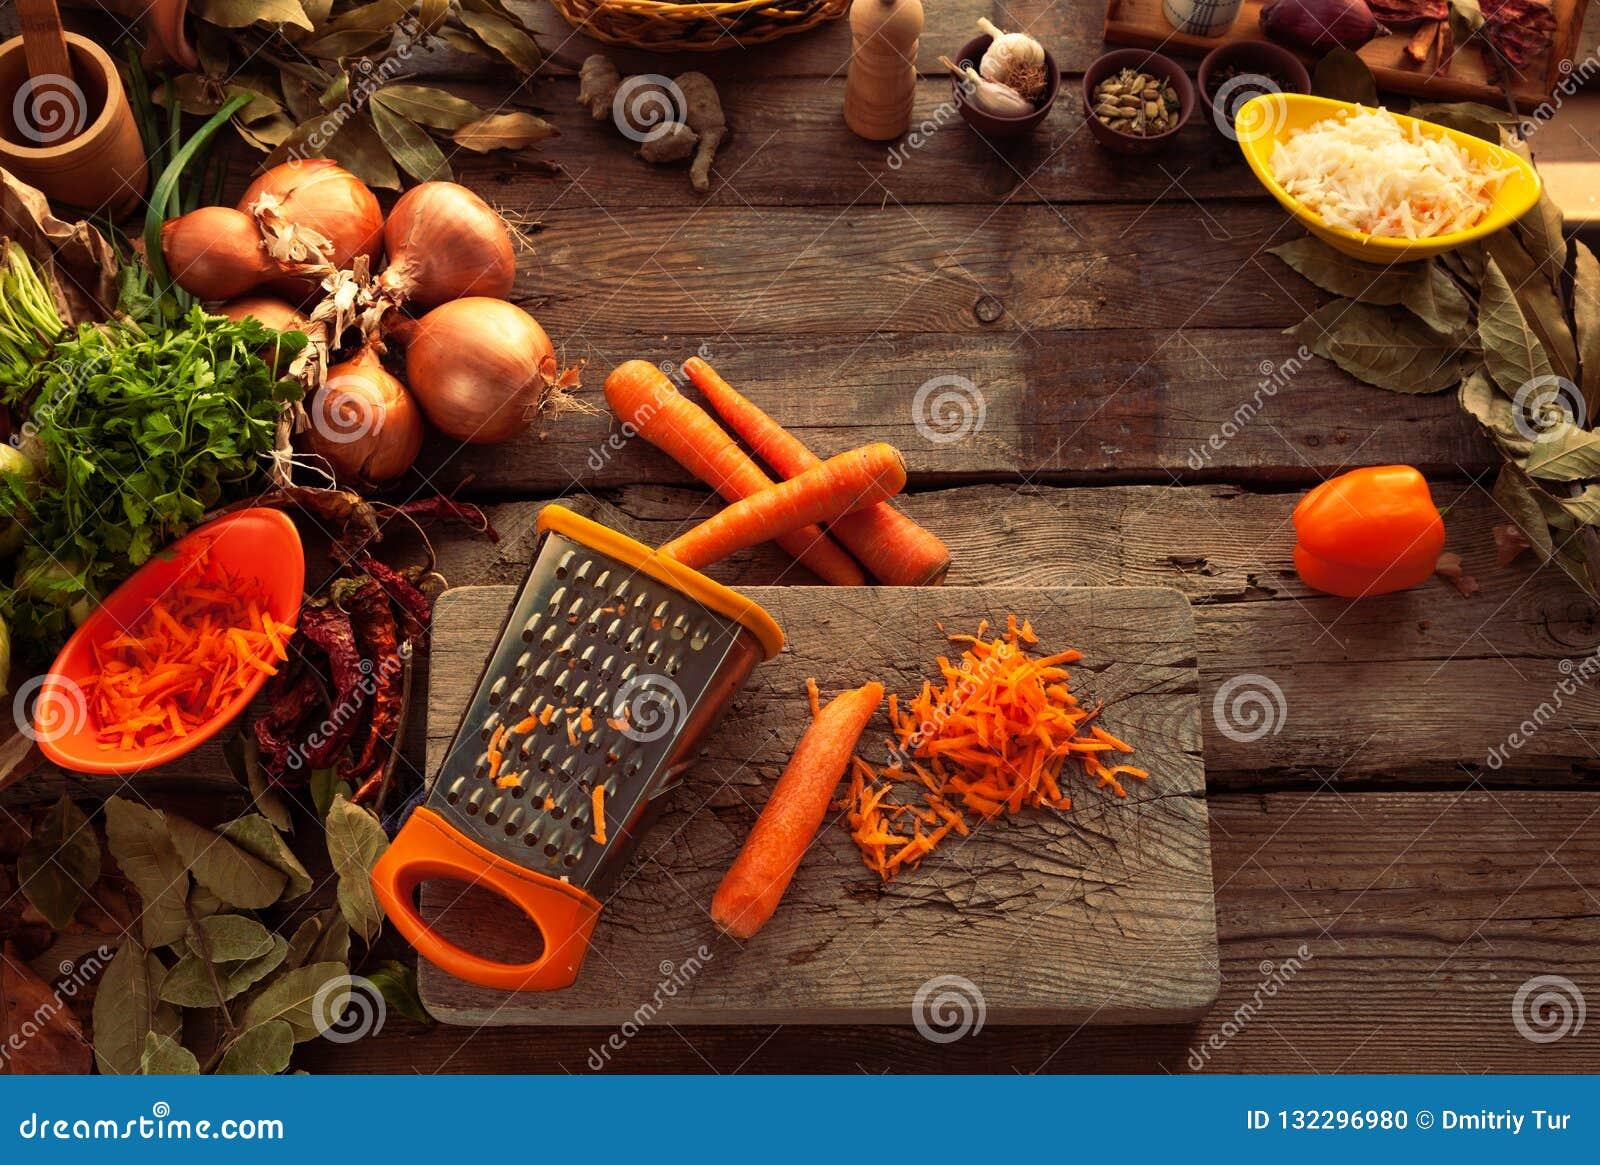 Моркови протиркой на терке